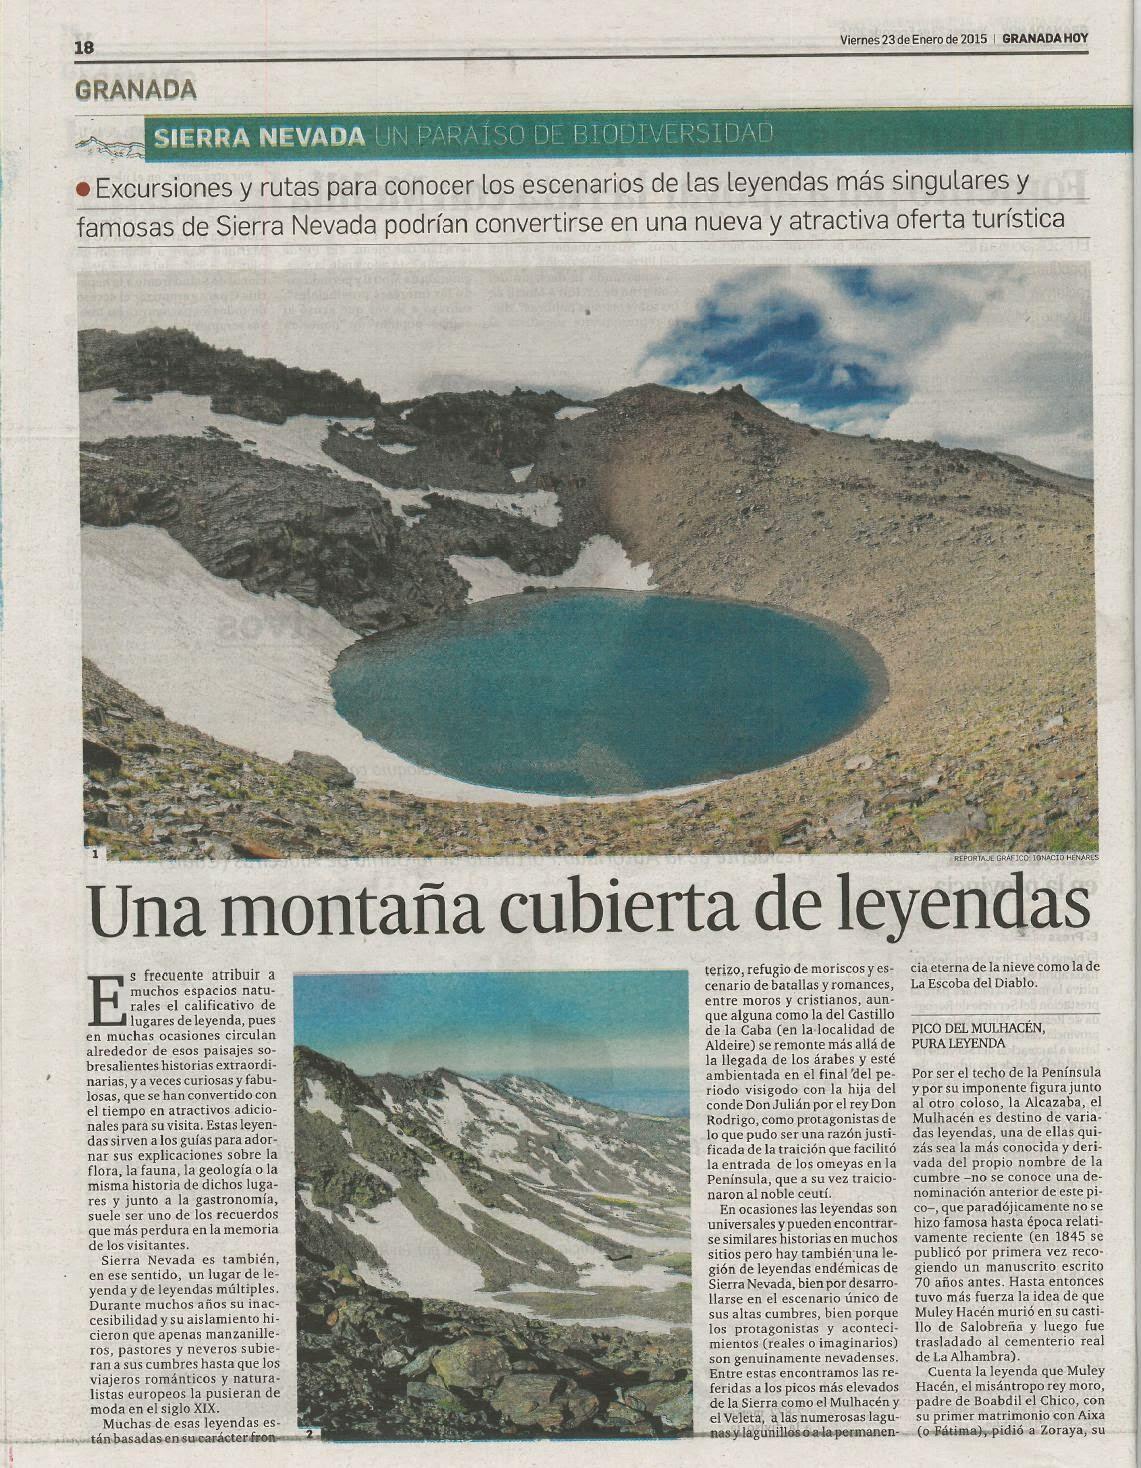 http://www.granadahoy.com/article/granada/1945837/una/montana/cubierta/leyendas.html